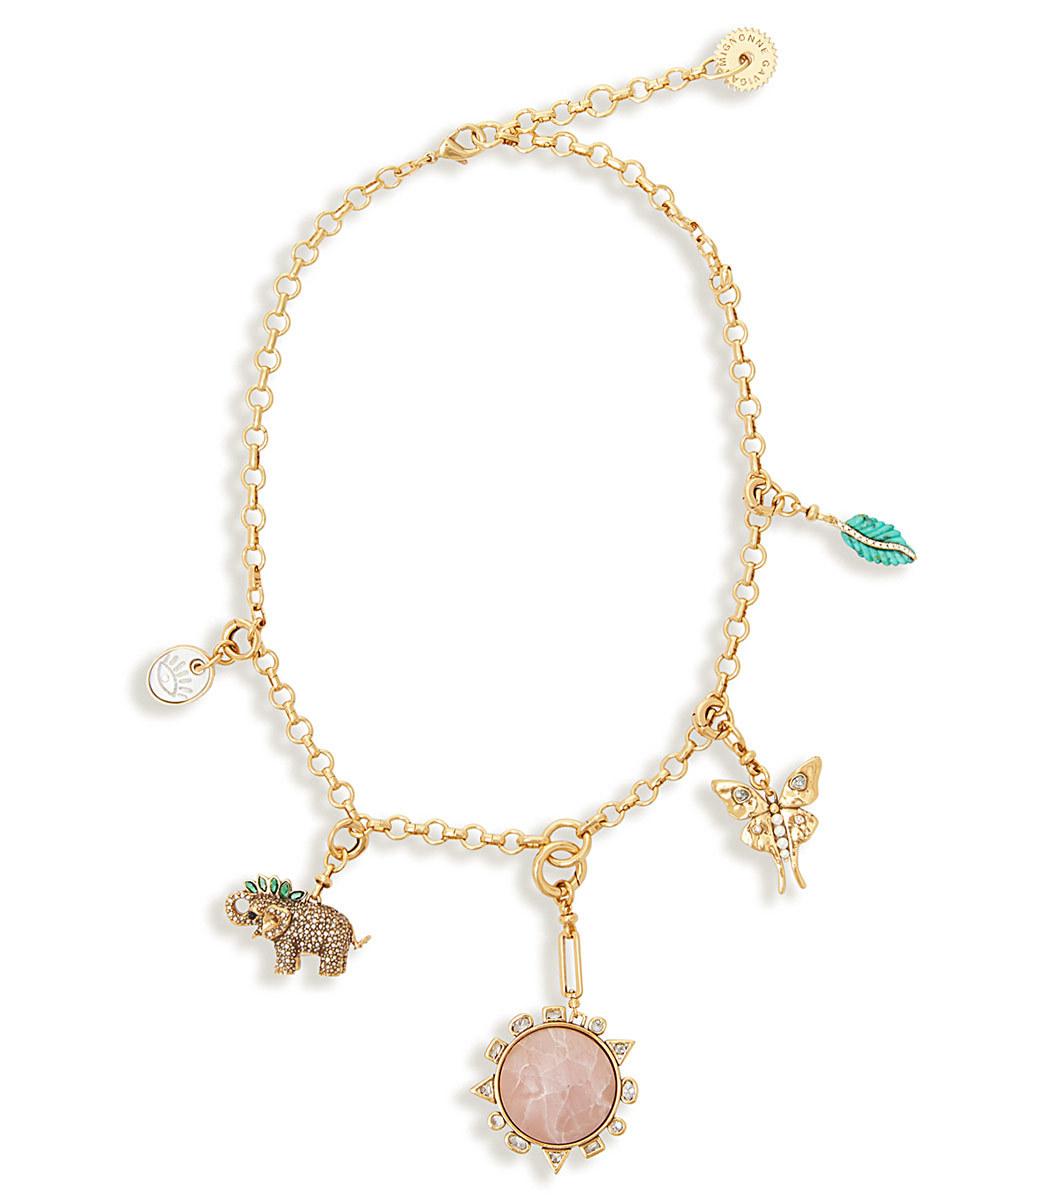 Mignonne Gavigan Menagerie Necklace Blush